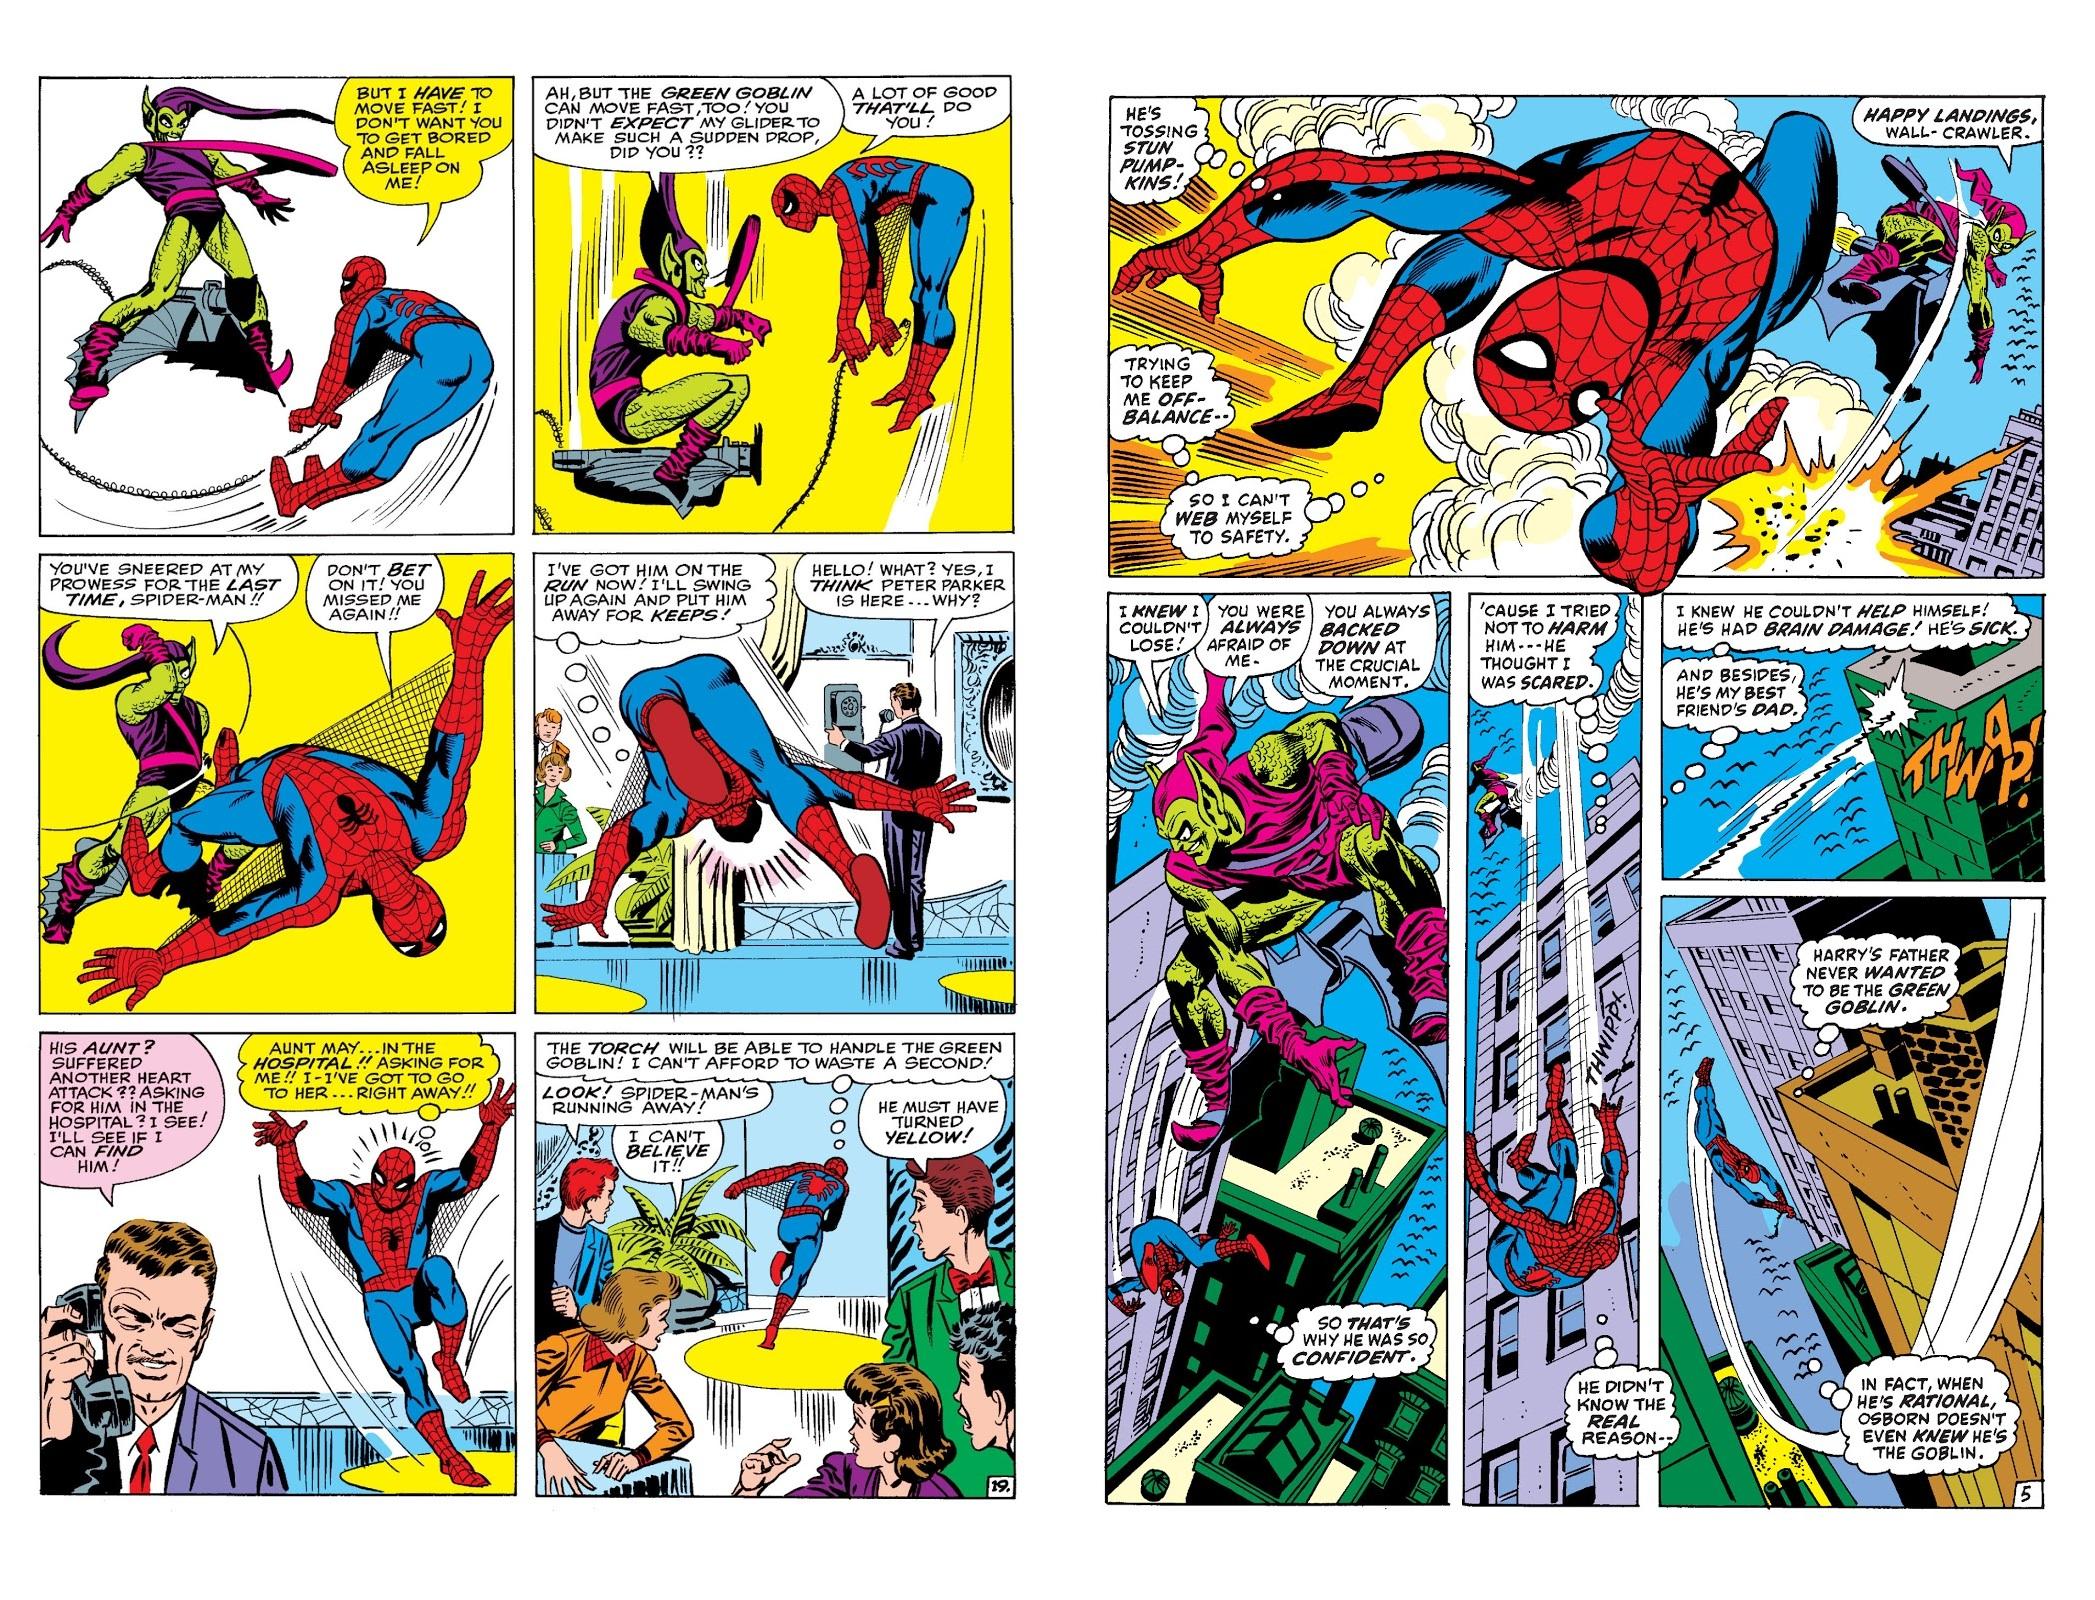 Spider-Man vs Green Goblin review